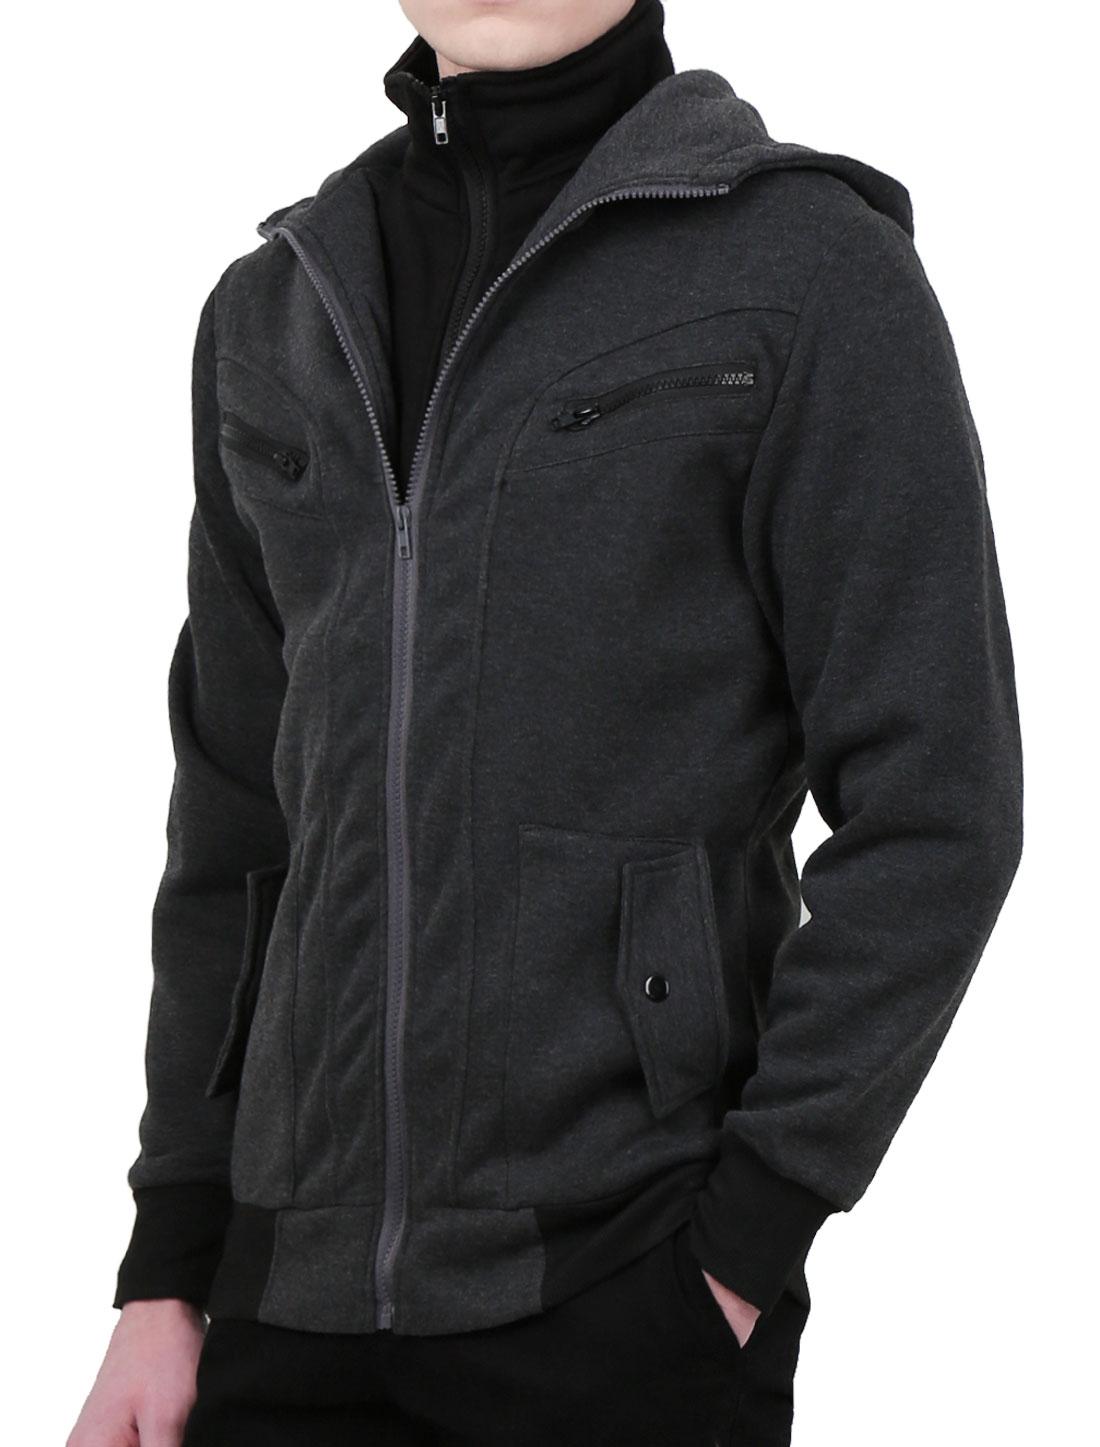 Man Unremoverable Hooded Long Sleeve Fashionable Hoodie Dark Gray L